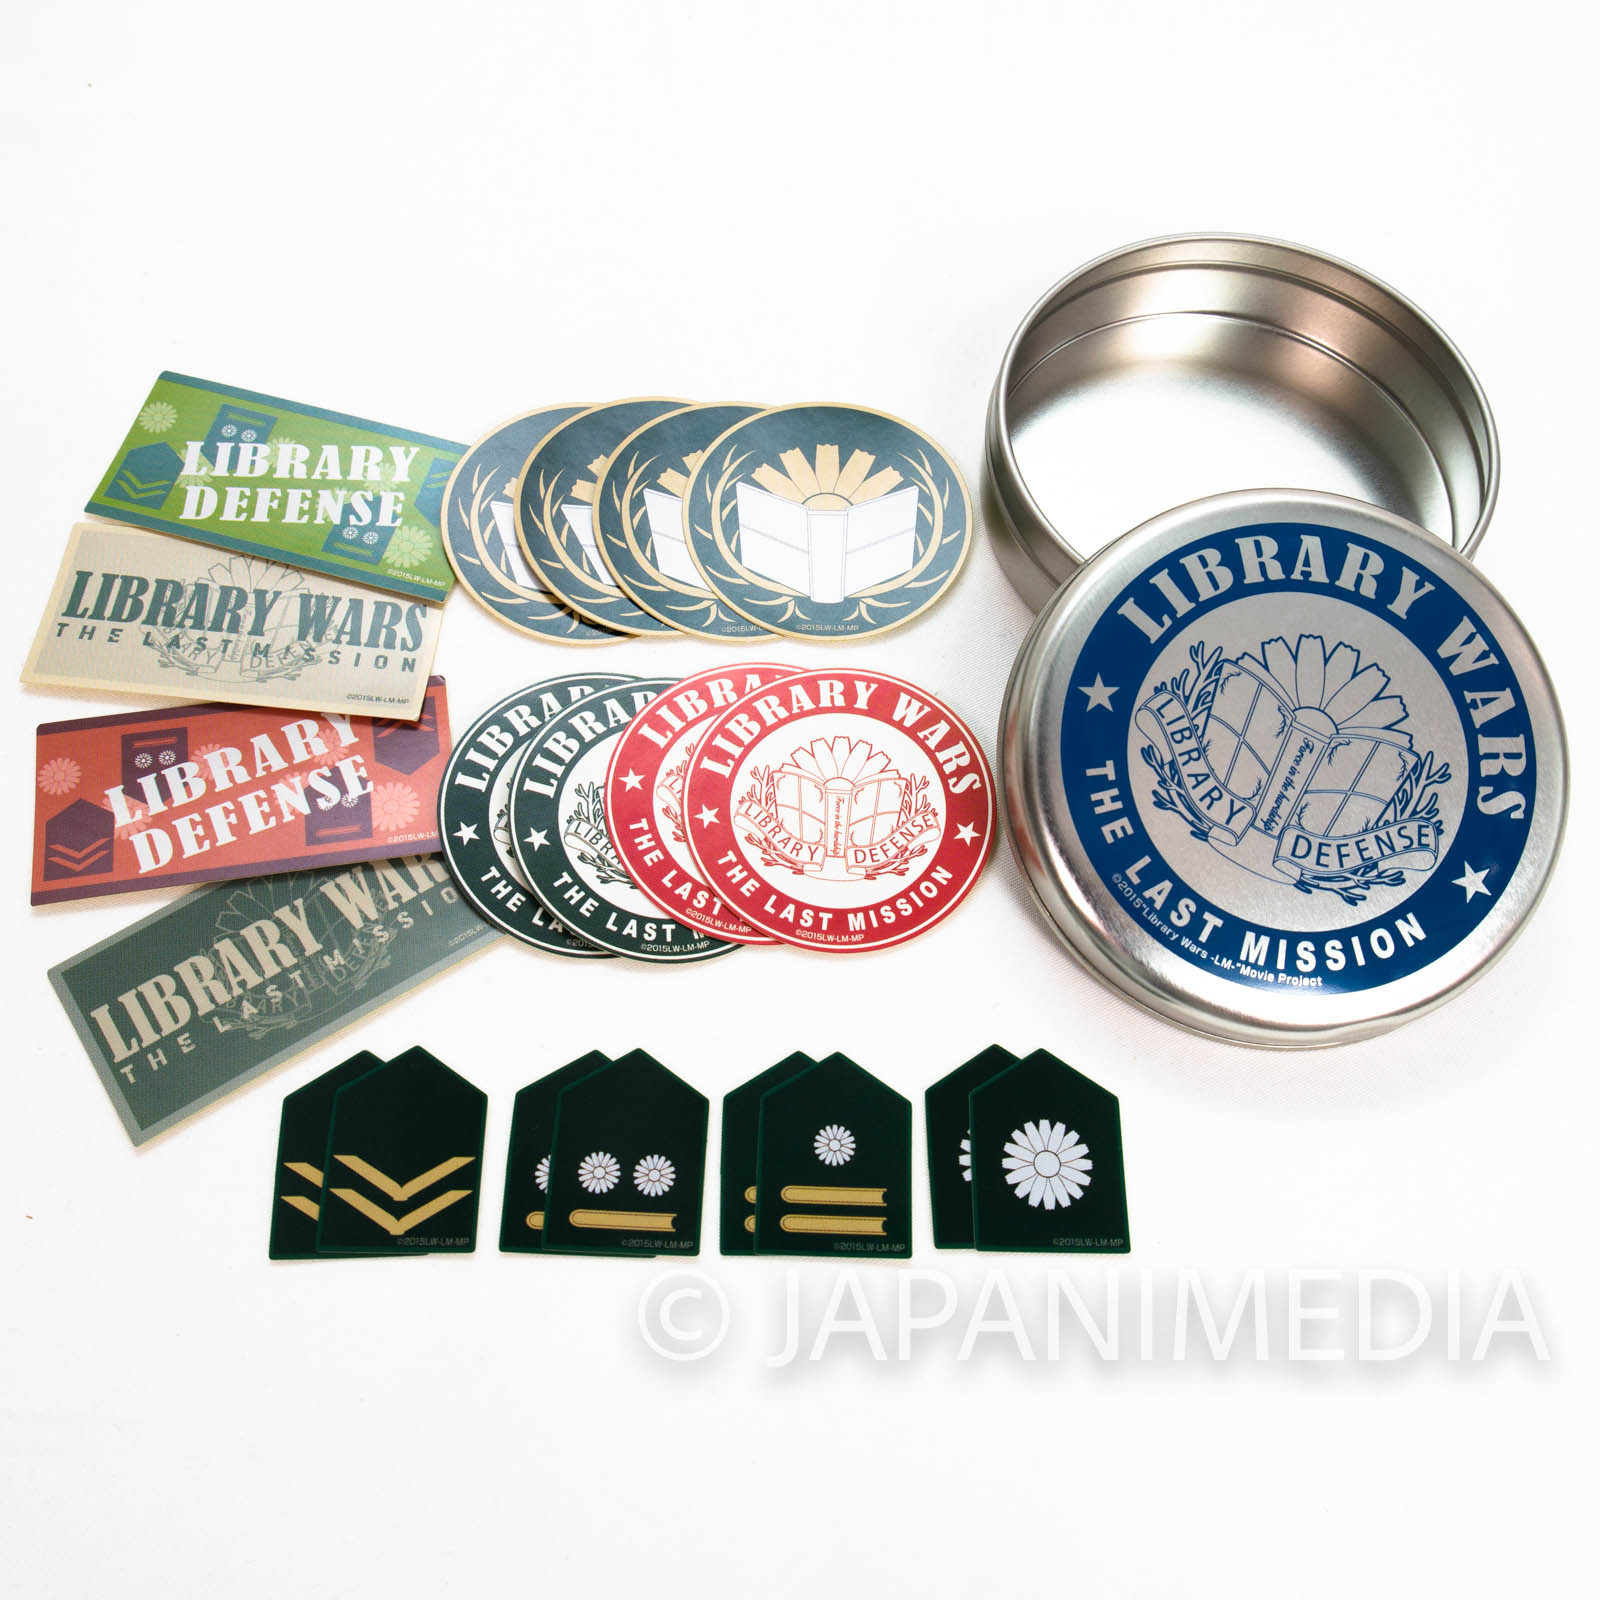 Library War: The Last Mission Mini Sticker 20pc & Can case Set JAPAN (LIVE-ACIOTN MOVIE)